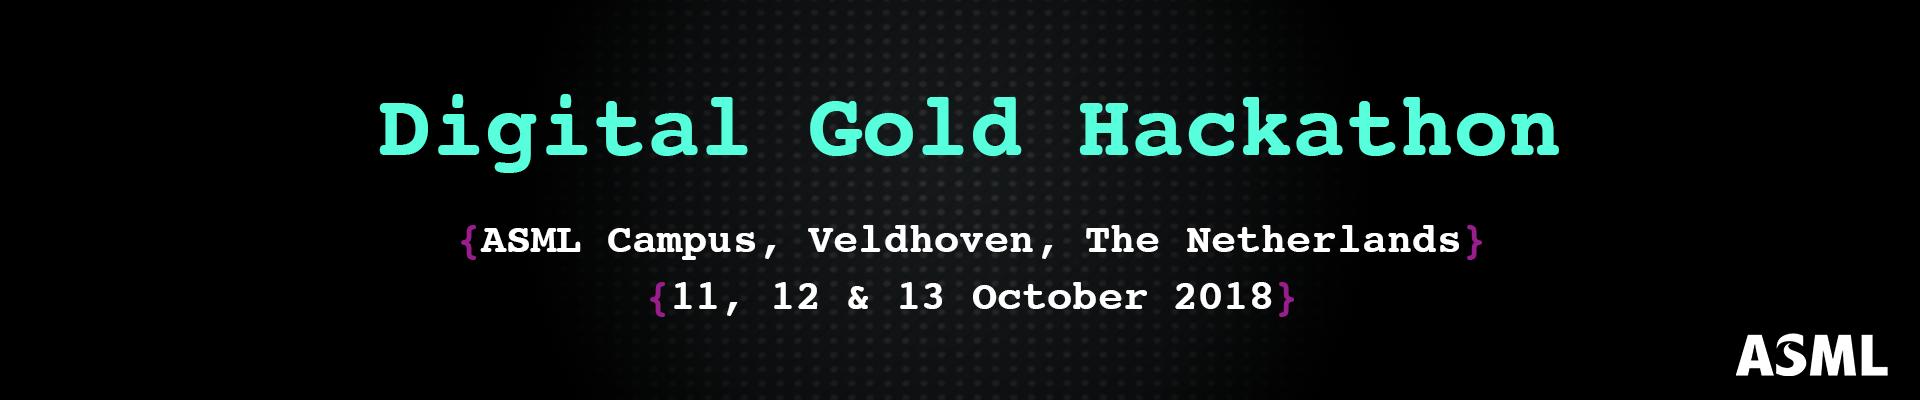 ASML Digital Gold Hackathon 2018